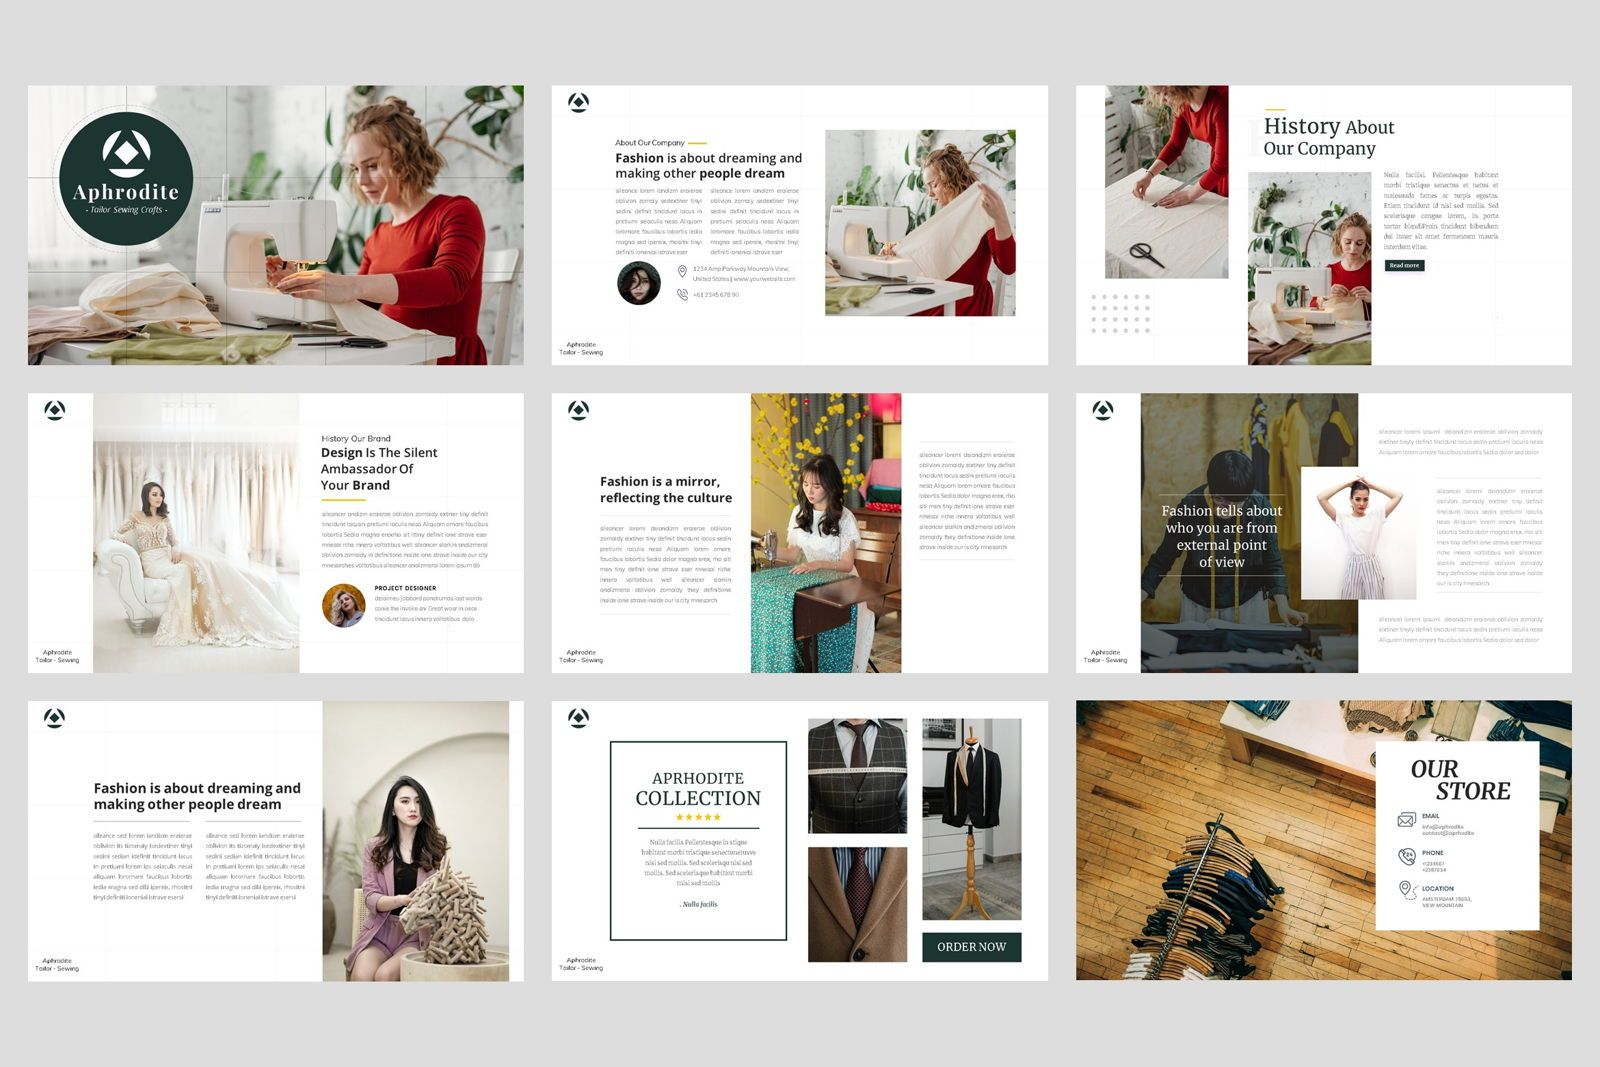 Tailor - Sewing Fashion Craft Keynote Template, Slide 2, 08633, Business Models — PoweredTemplate.com